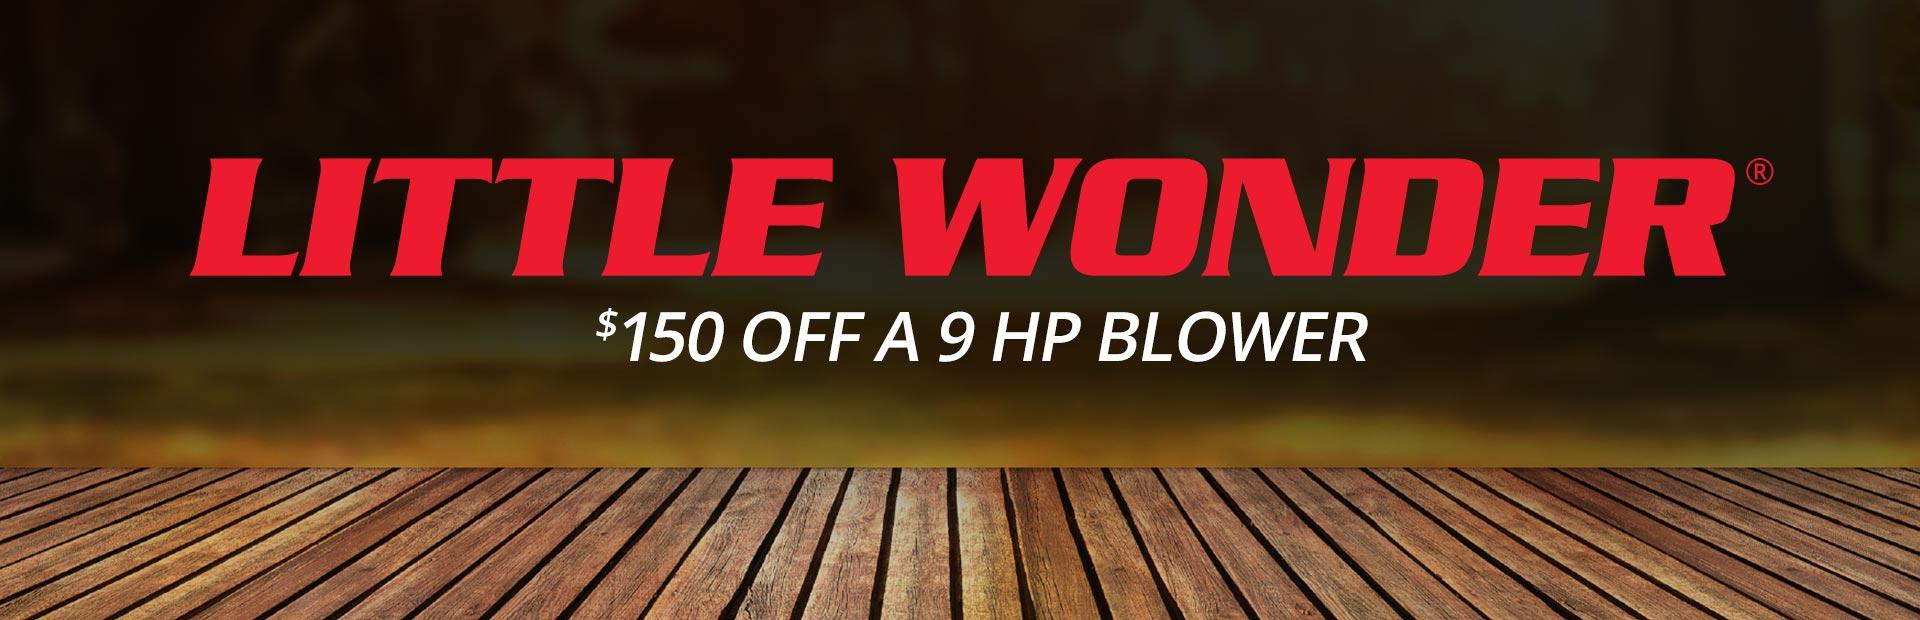 $150 Off A 9 HP Blower